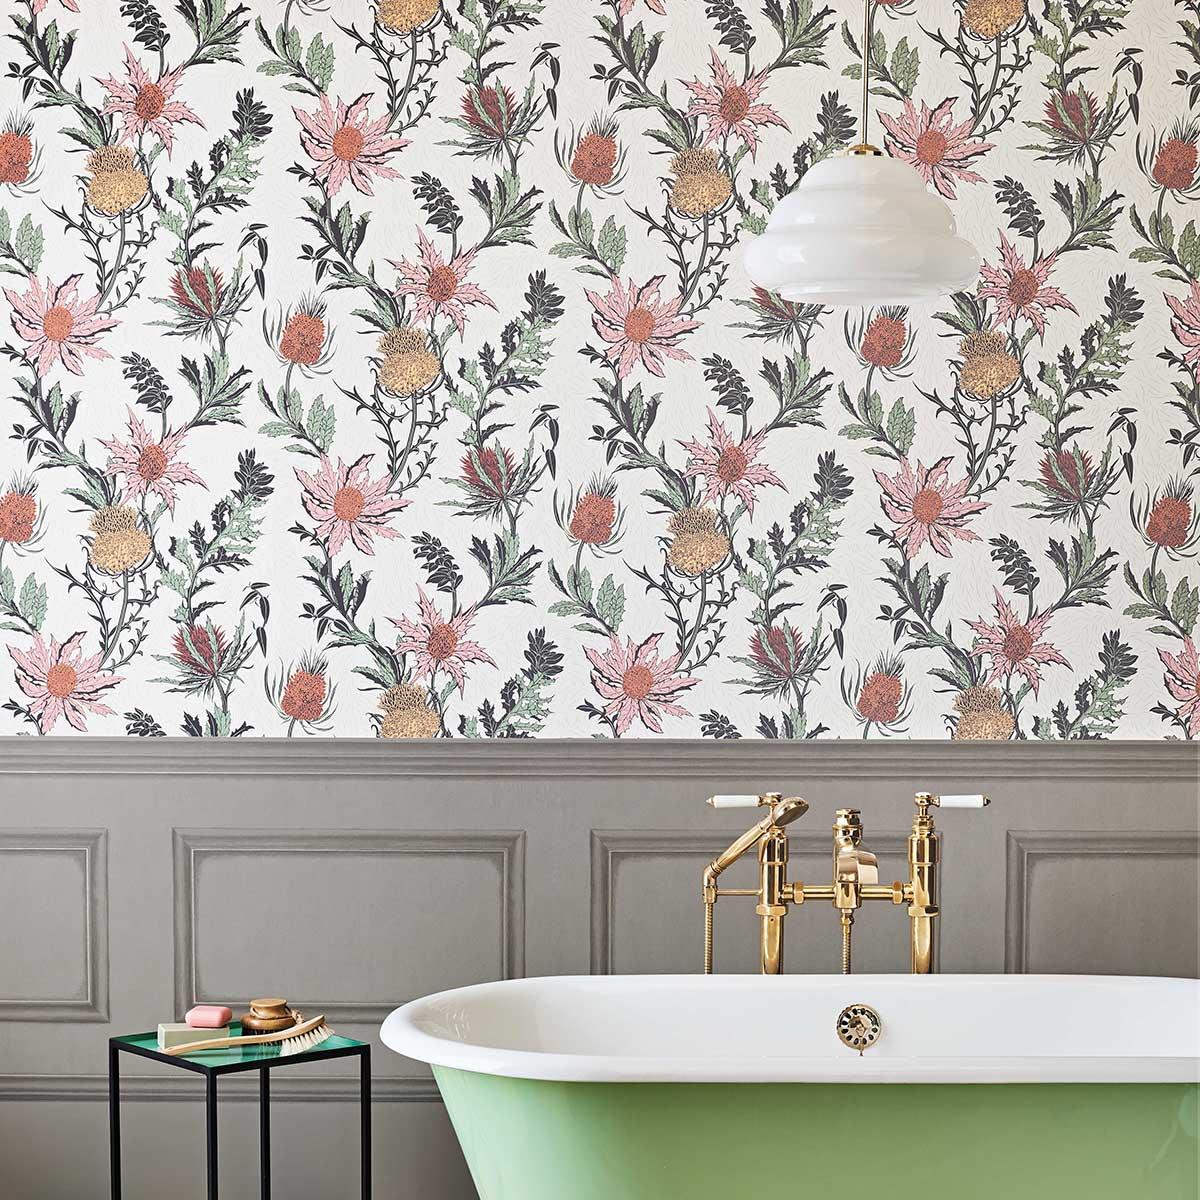 Thistle Wallpaper - Alabaster Pink / Orange - by Cole & Son